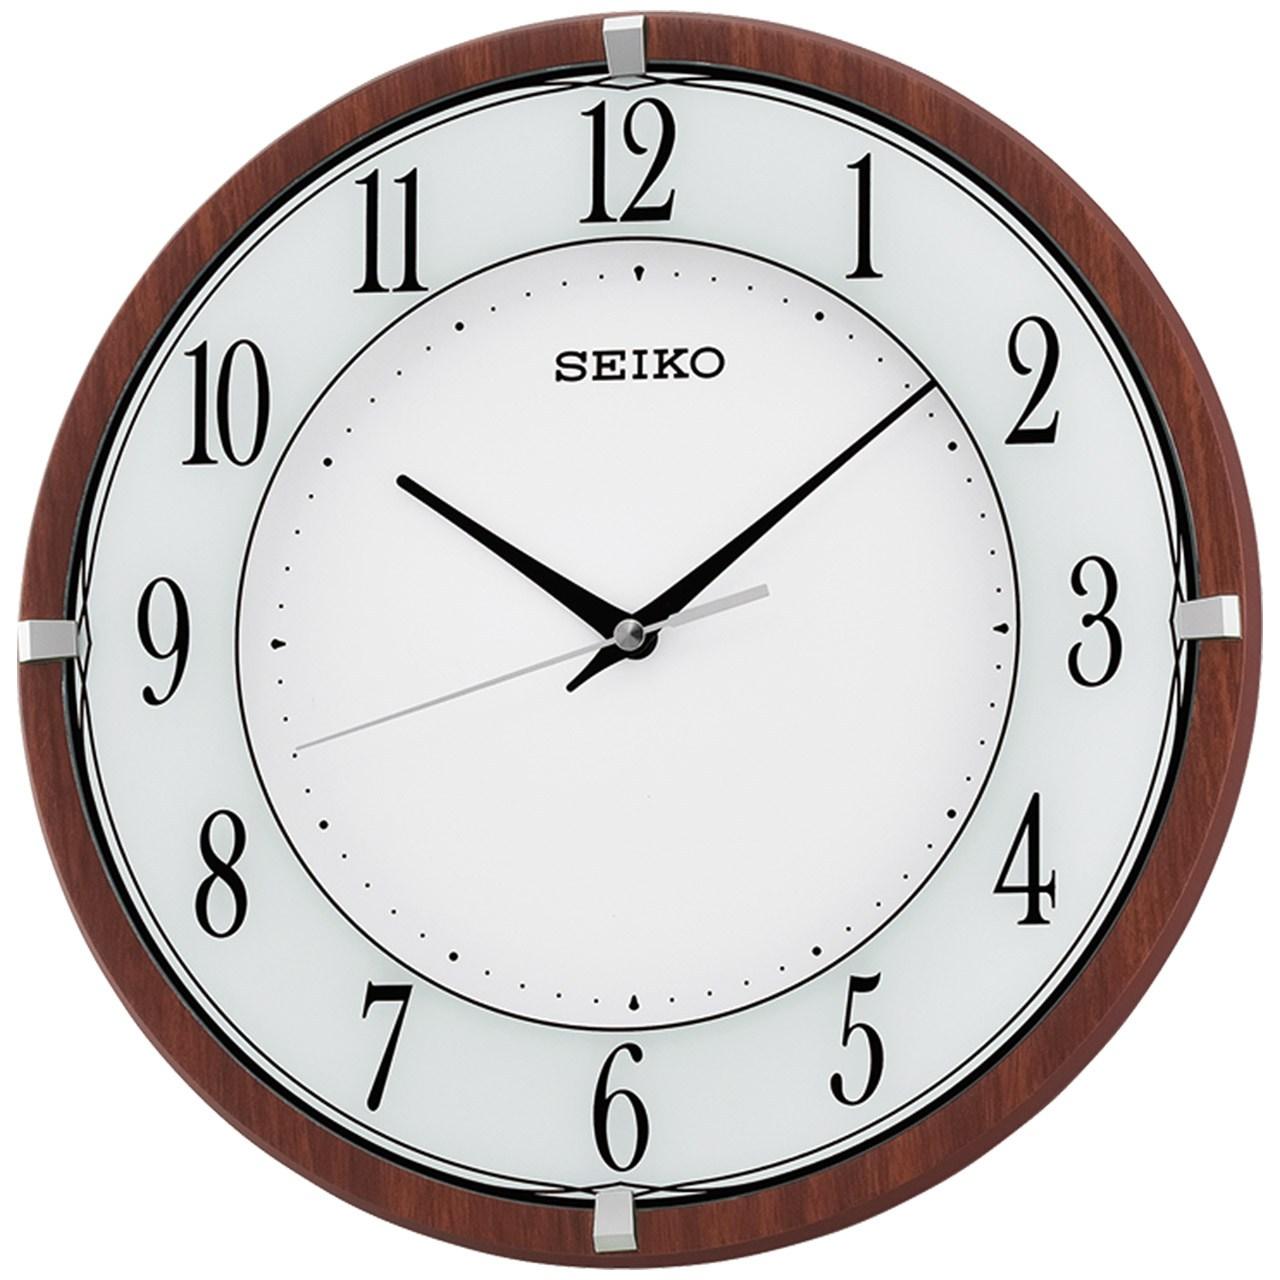 خرید ساعت دیواری سیکو مدل QXA678 | ساعت مچی